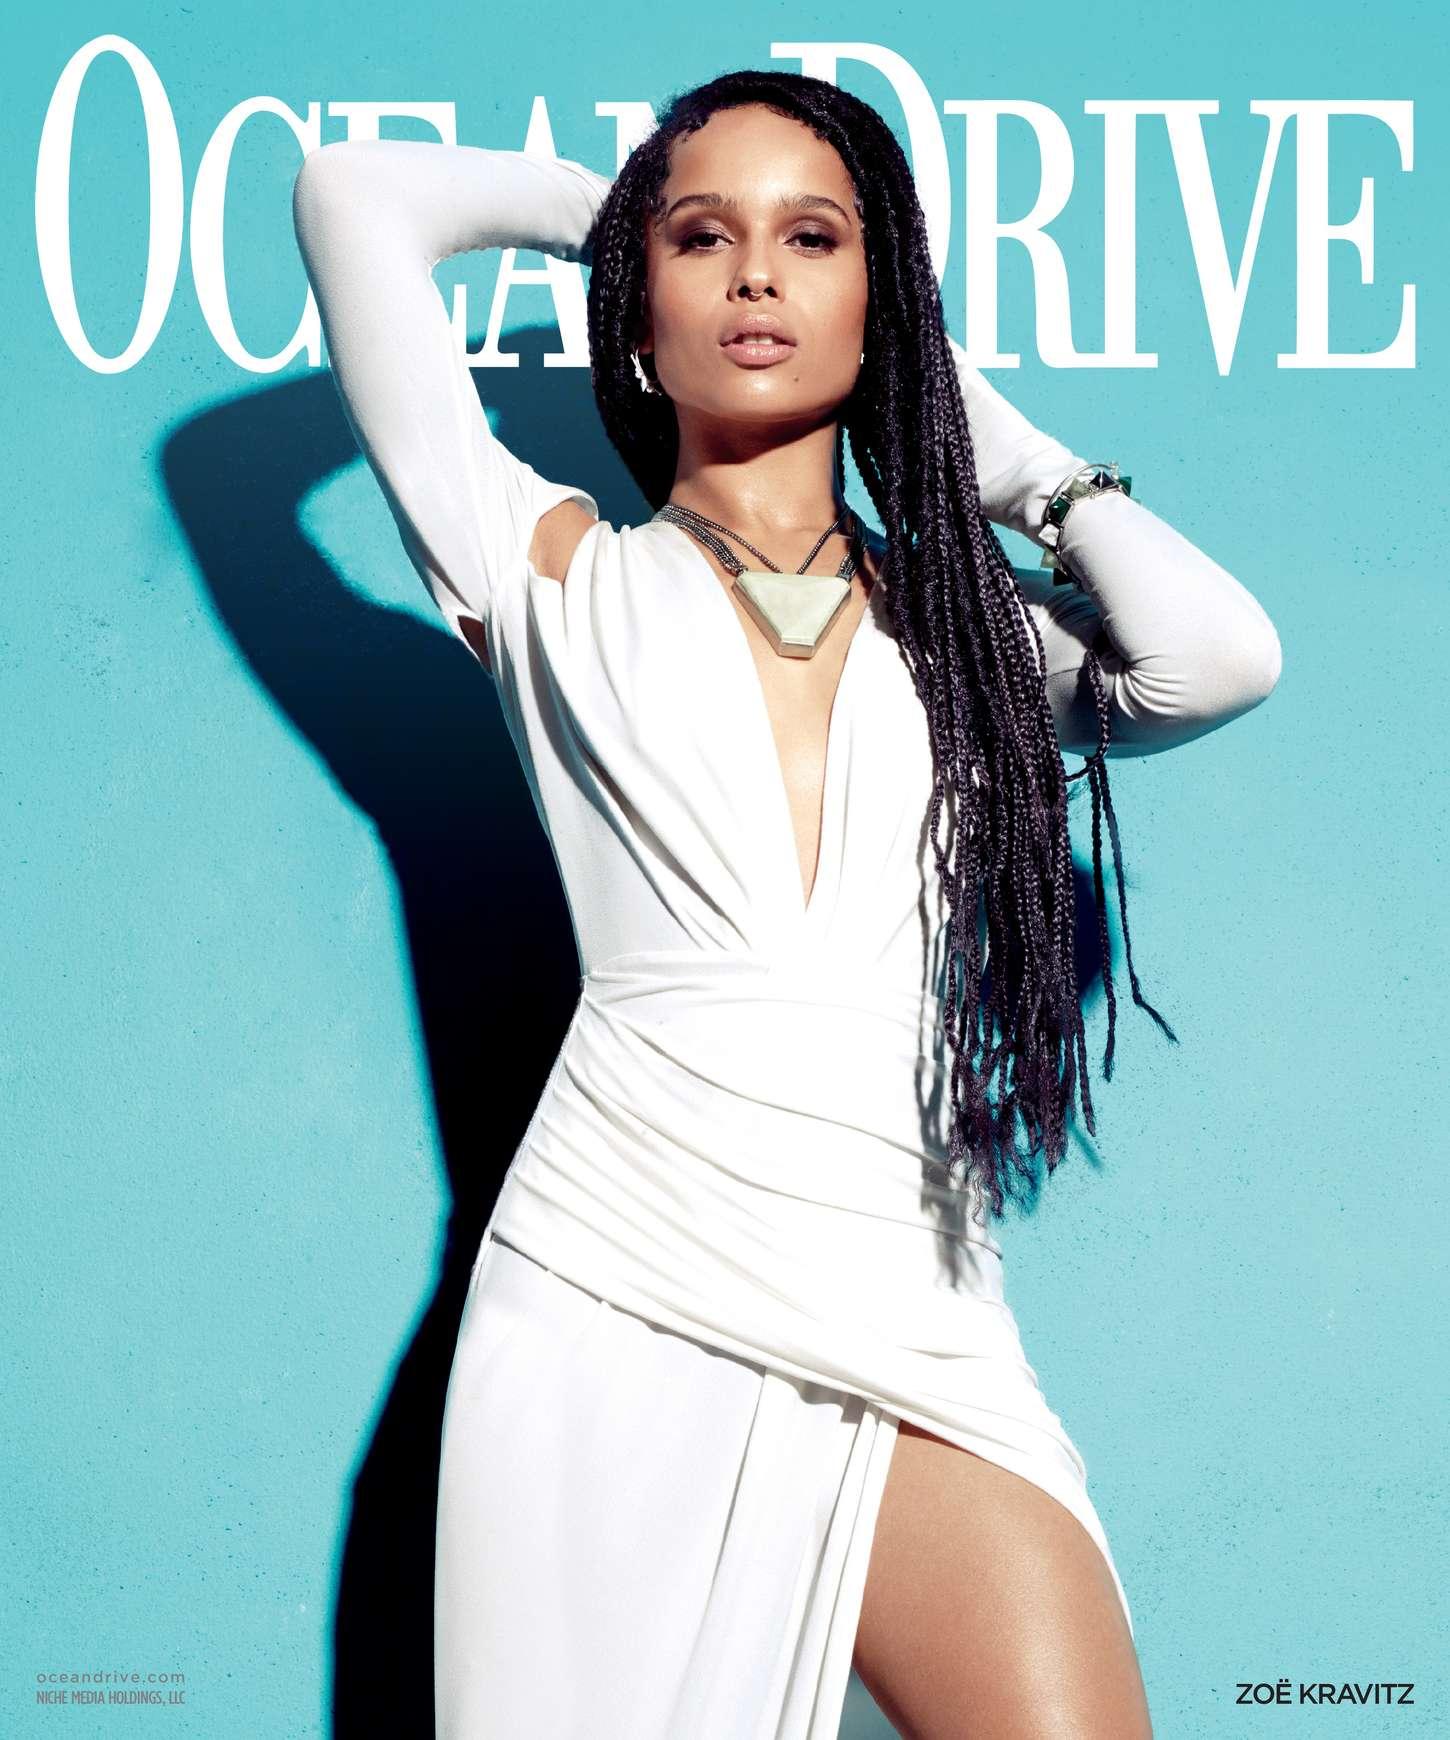 Zoe Kravitz Ocean Drive Magazine